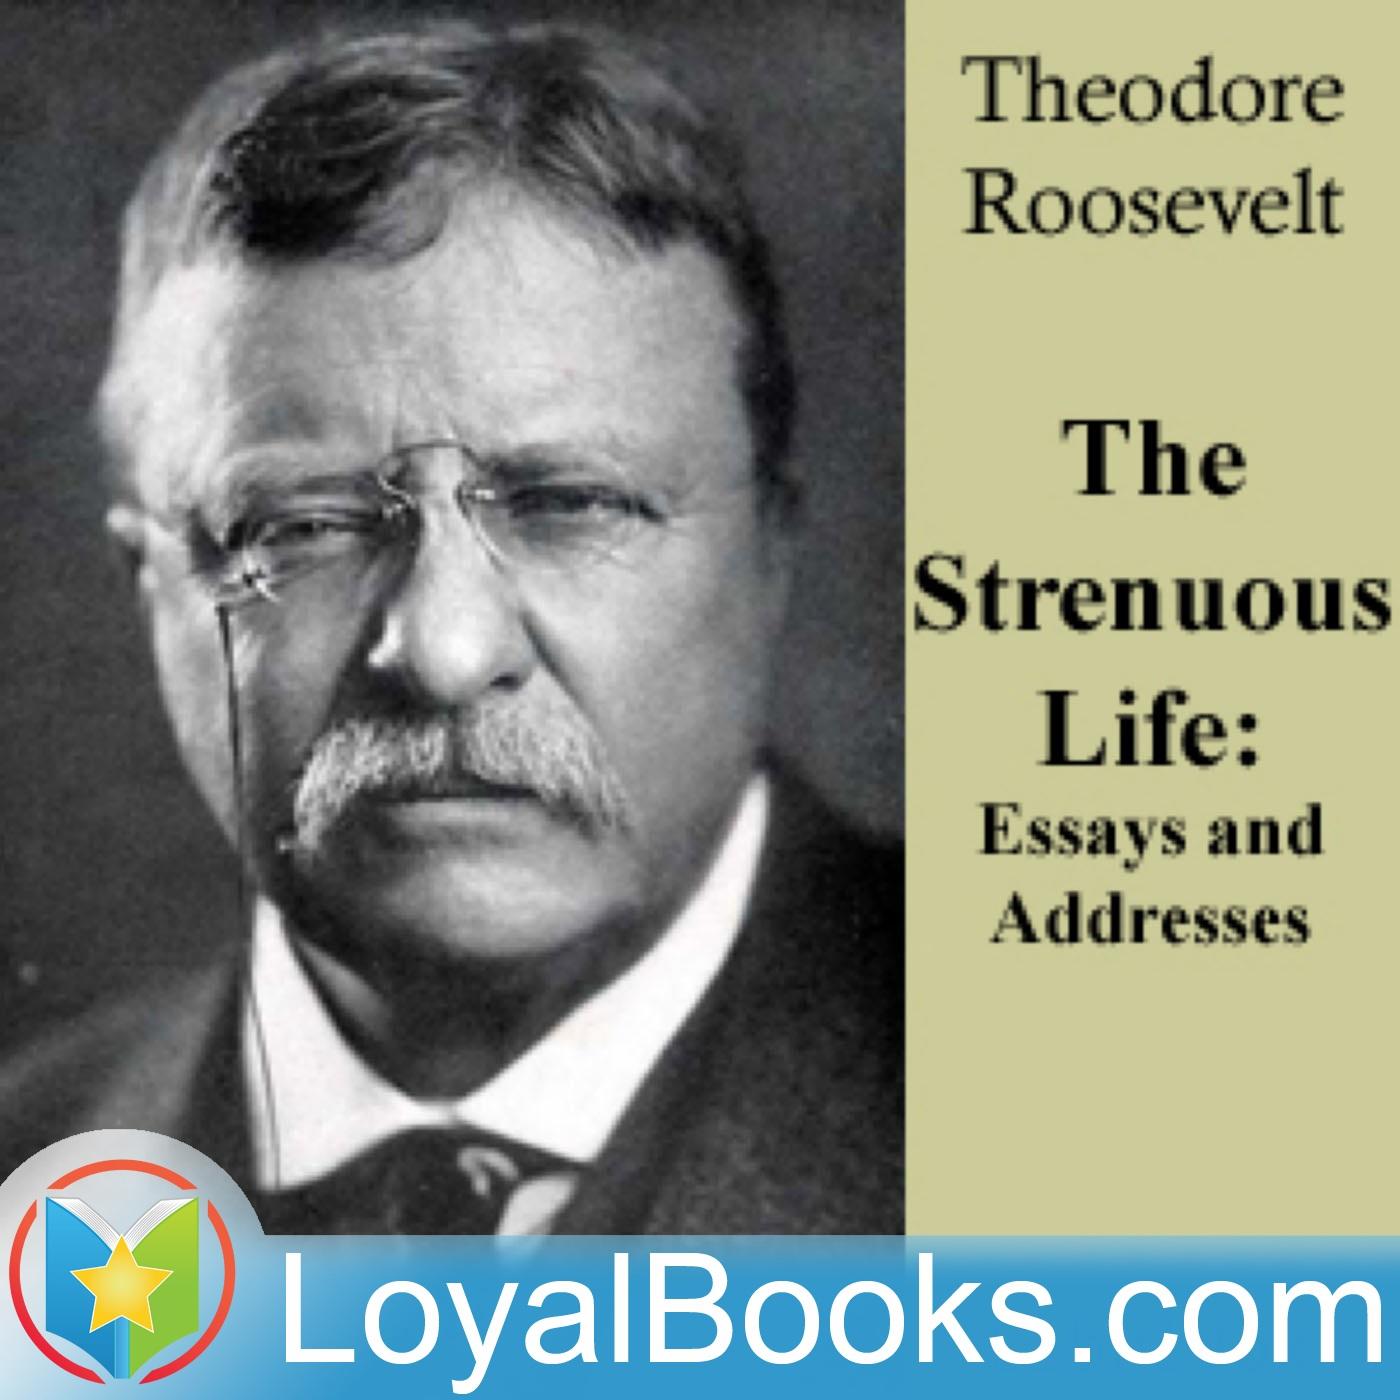 theodore roosevelt biography essay